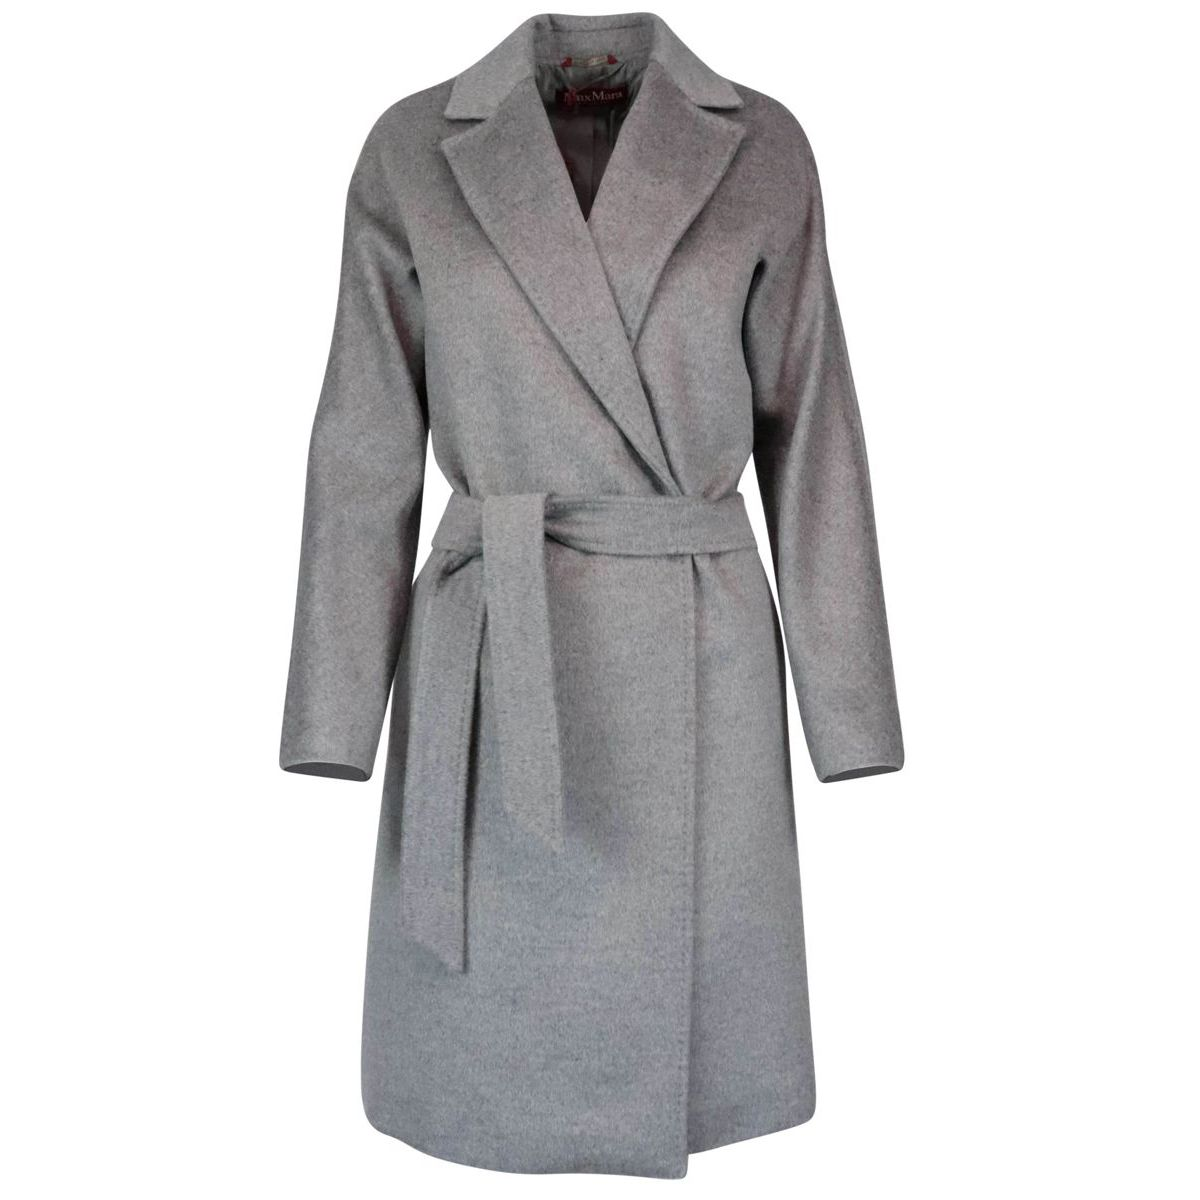 Luana belted coat in pure wool Medium gray MAX MARA STUDIO